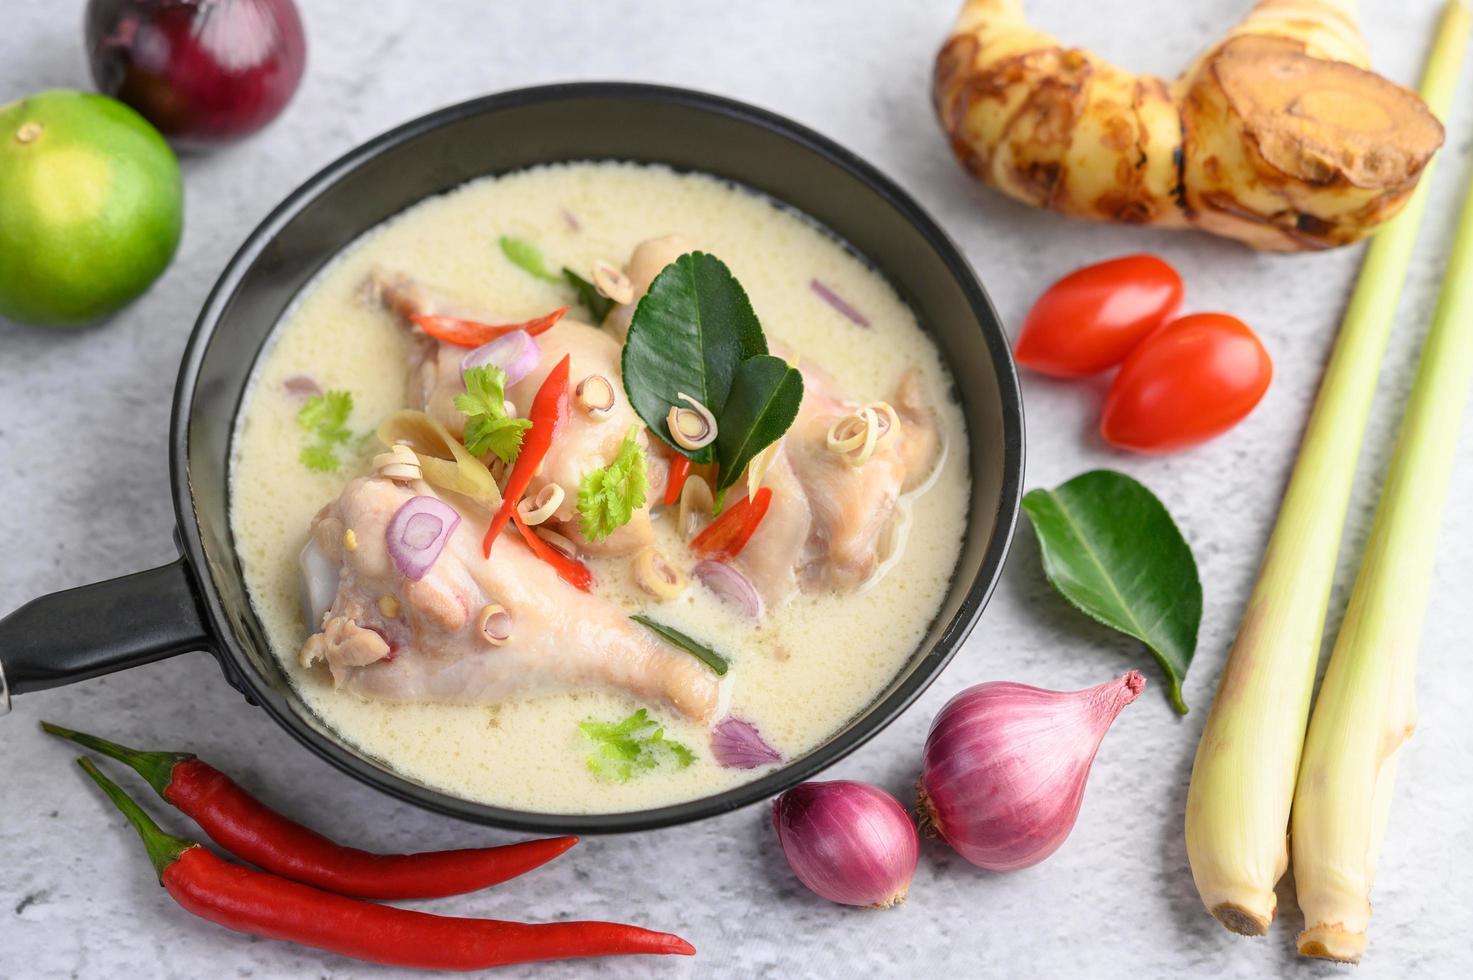 sopa tom kha kai con hojas de lima kaffir, limoncillo, cebolla morada, galanga y chile foto